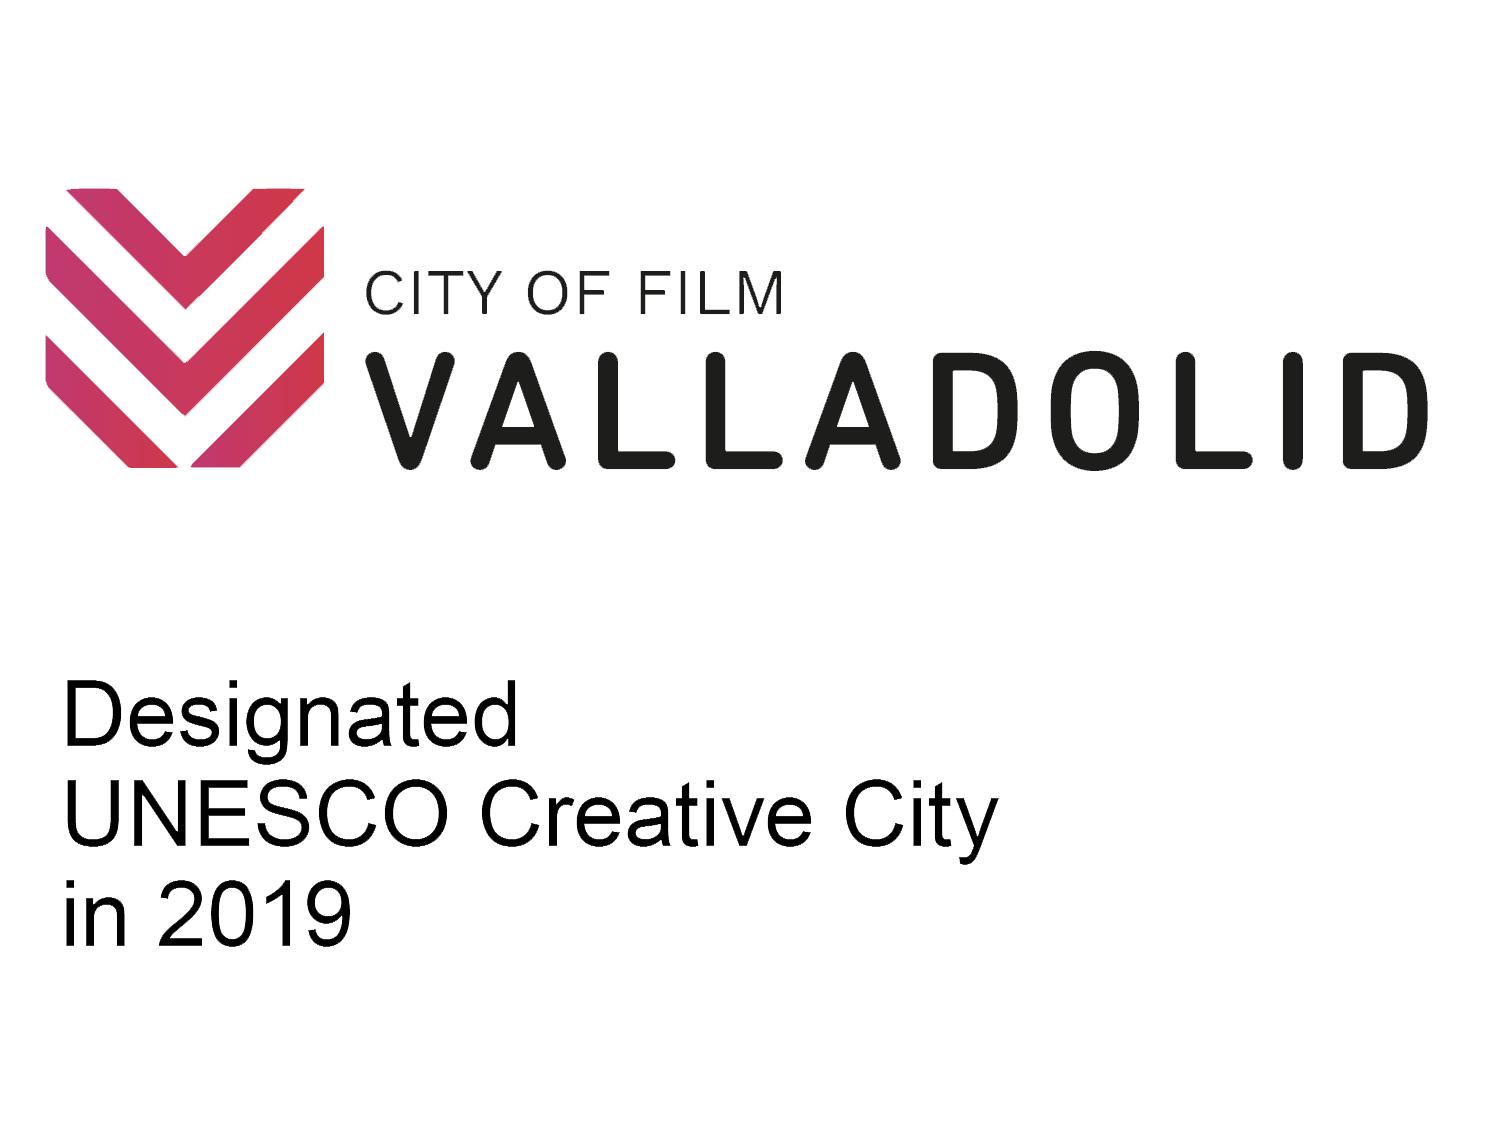 VALLADOLID CITY OF FILM